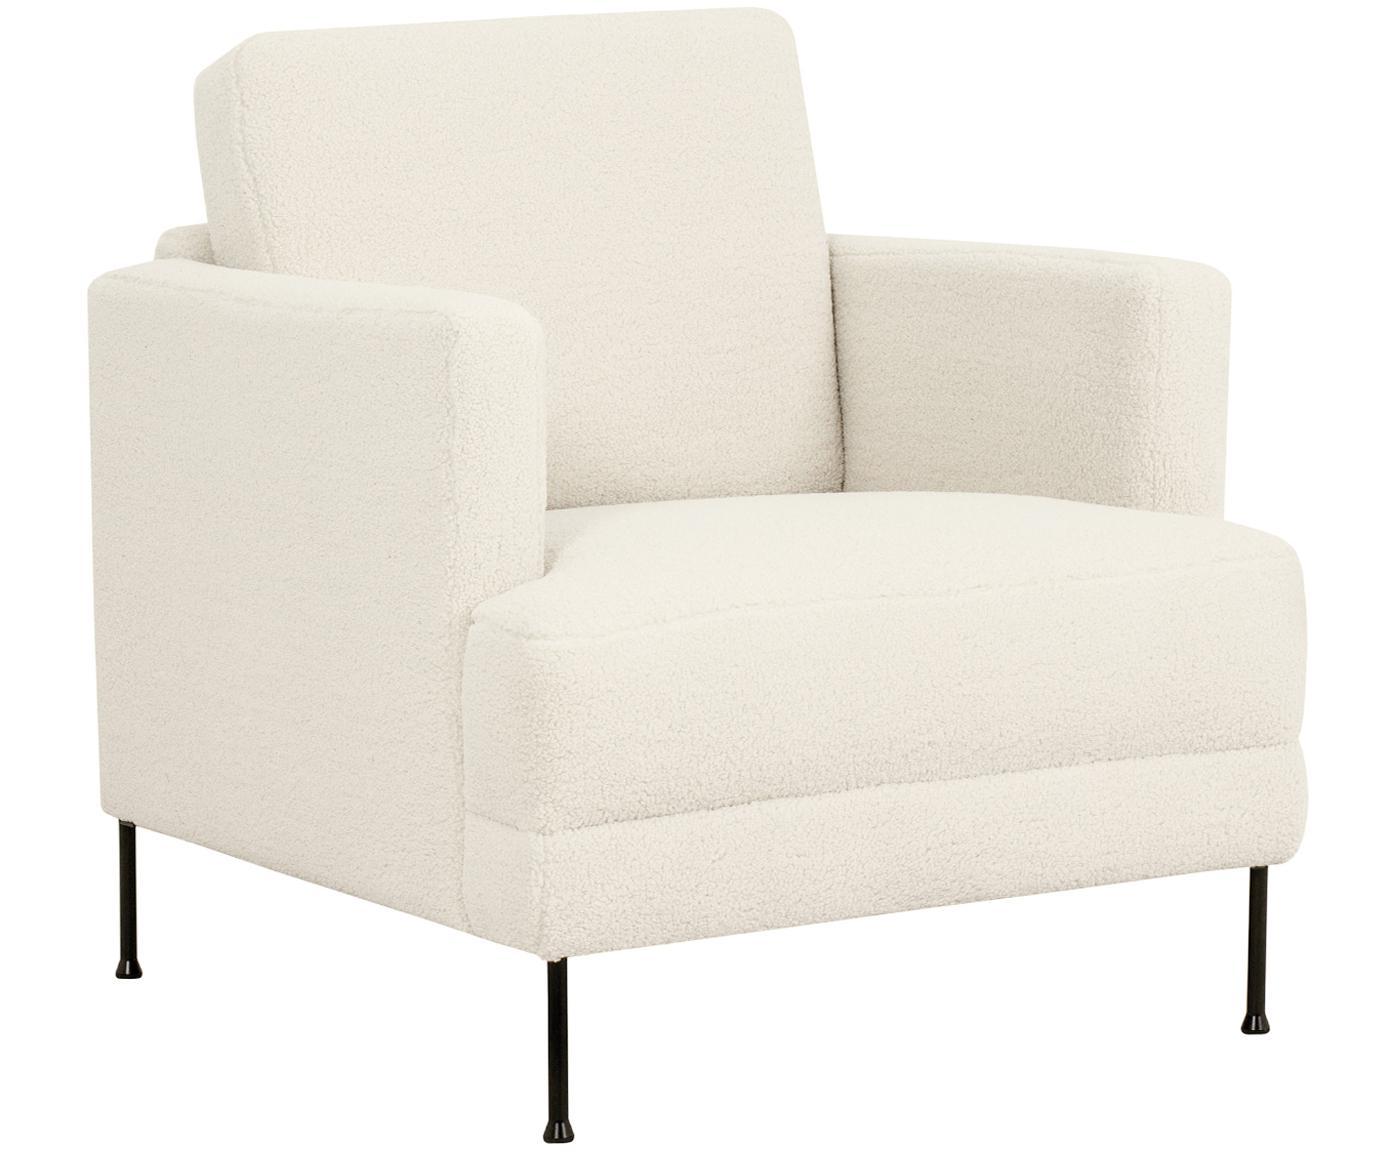 Teddy-Sessel Fluente, Bezug: Polyester (Teddyfell) 40., Gestell: Massives Kiefernholz, Füße: Metall, lackiert, Teddy Cremeweiß, 76 x 85 cm